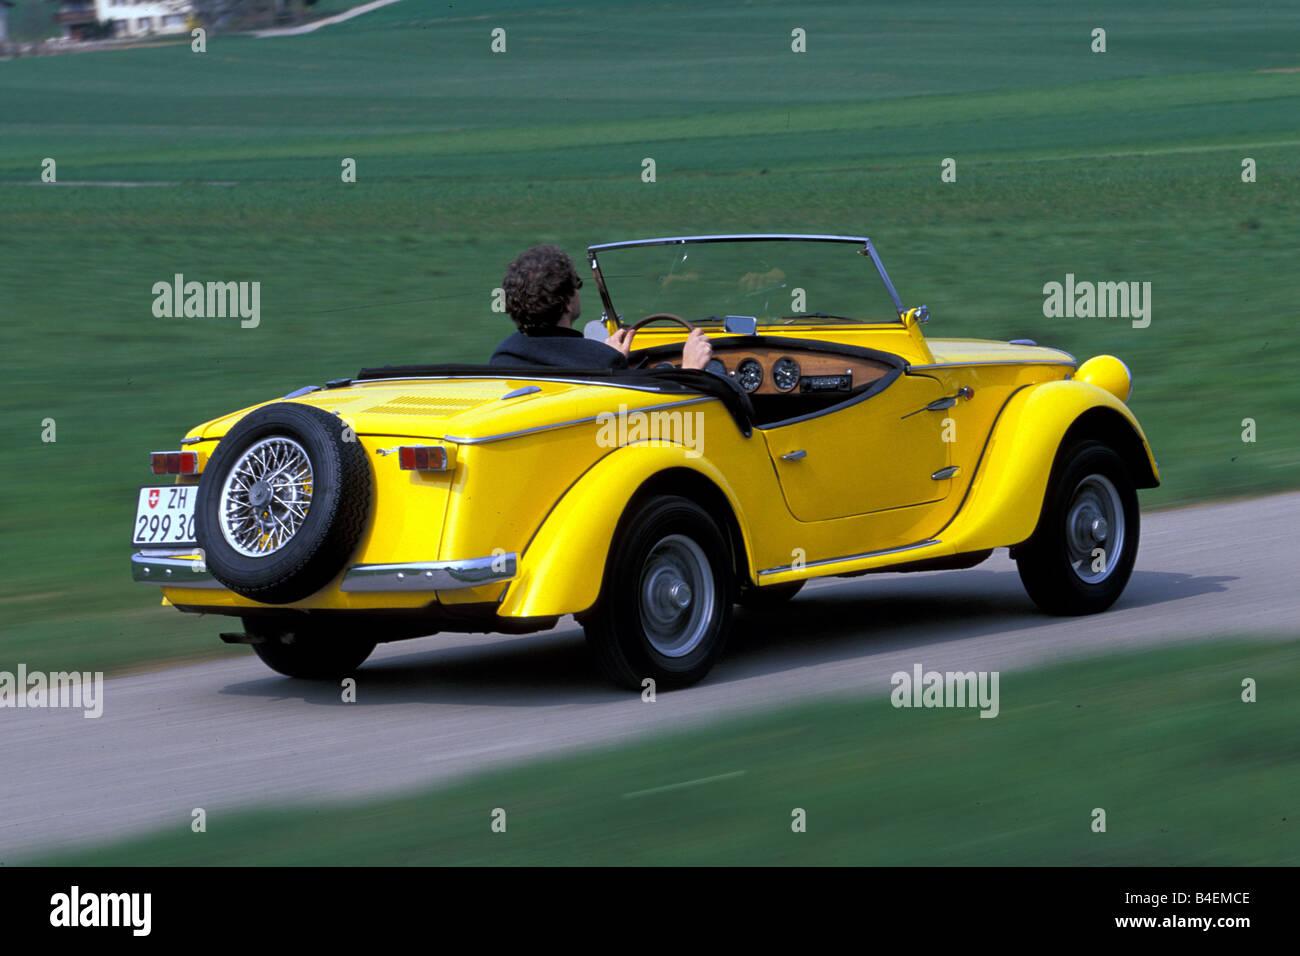 Car Siata Spring Convertible Model Year 1968 1970 Yellow Vintage